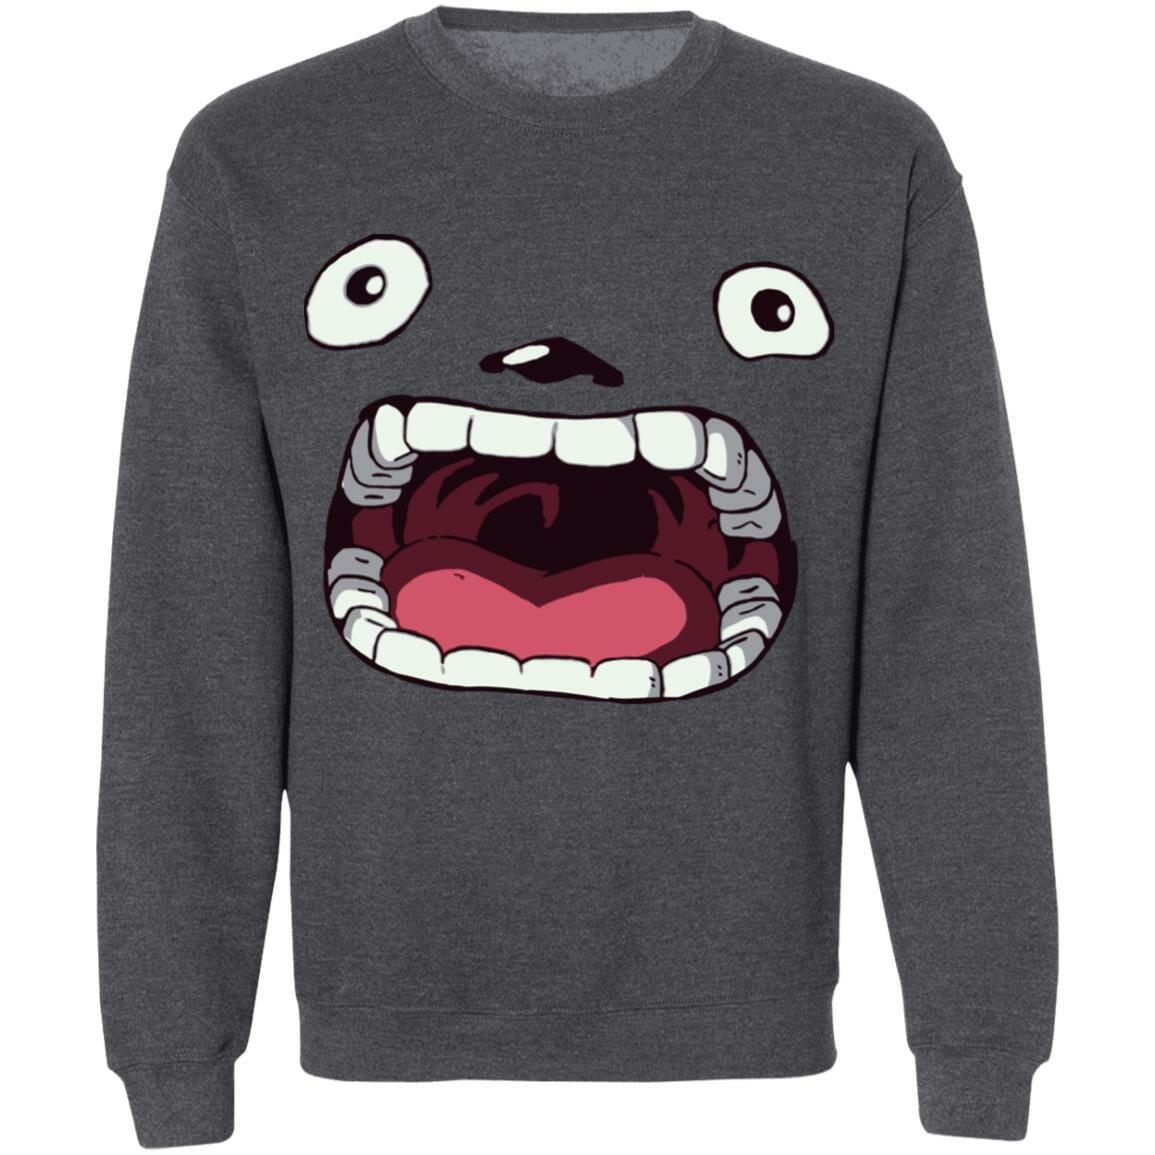 My Neighbor Totoro – Big Mouth Sweatshirt